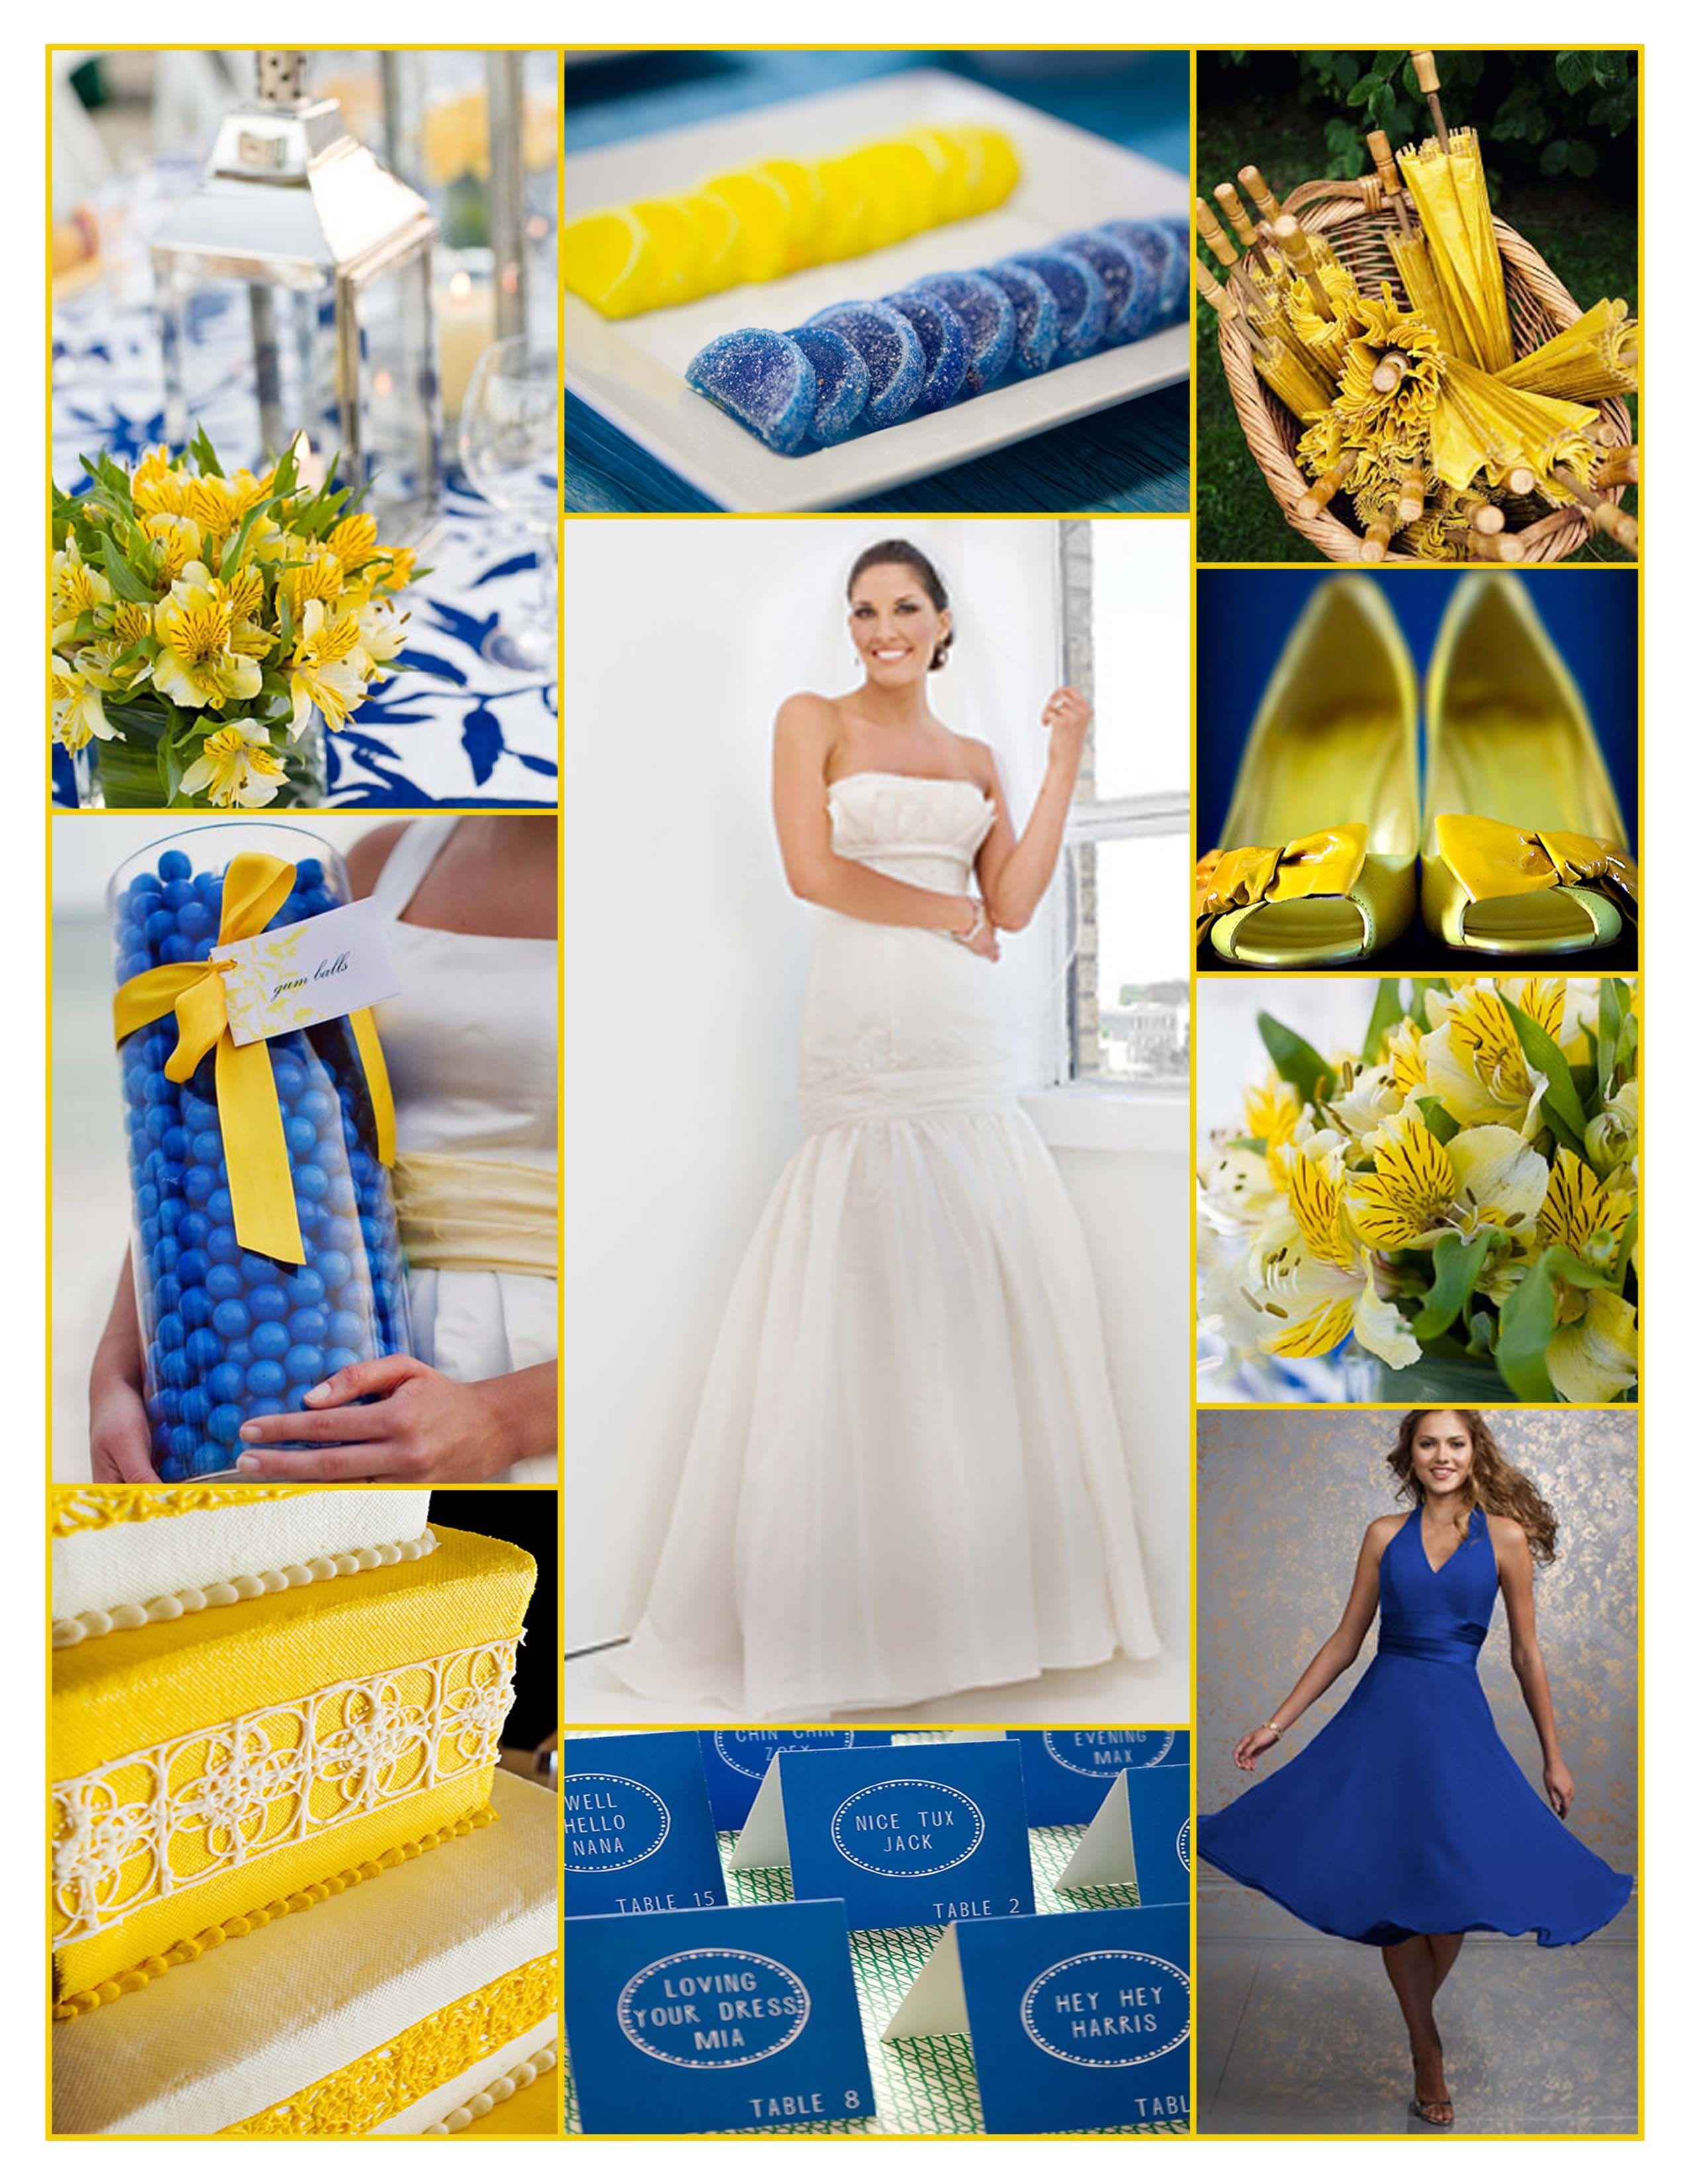 Blue and yellow wedding inspiration | Melisa\'s Wedding | Pinterest ...